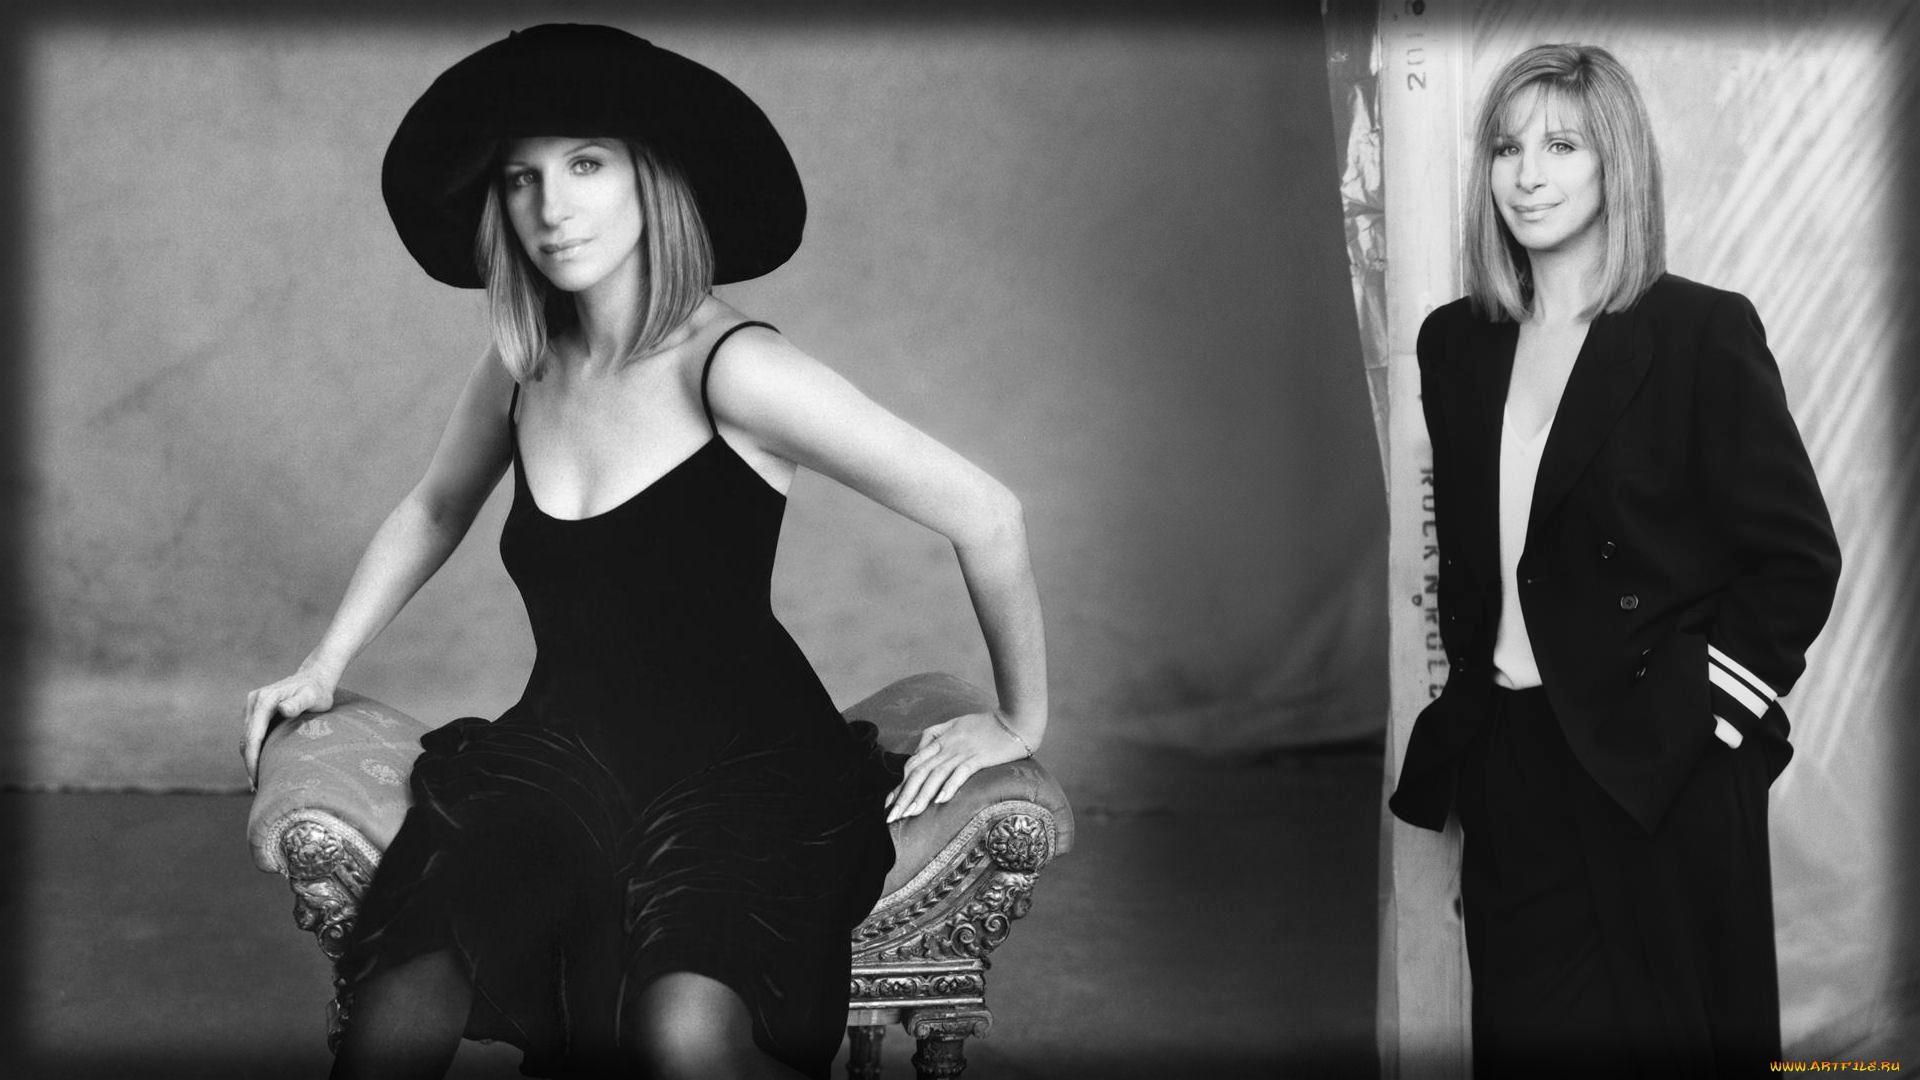 Barbra Streisand Wallpapers